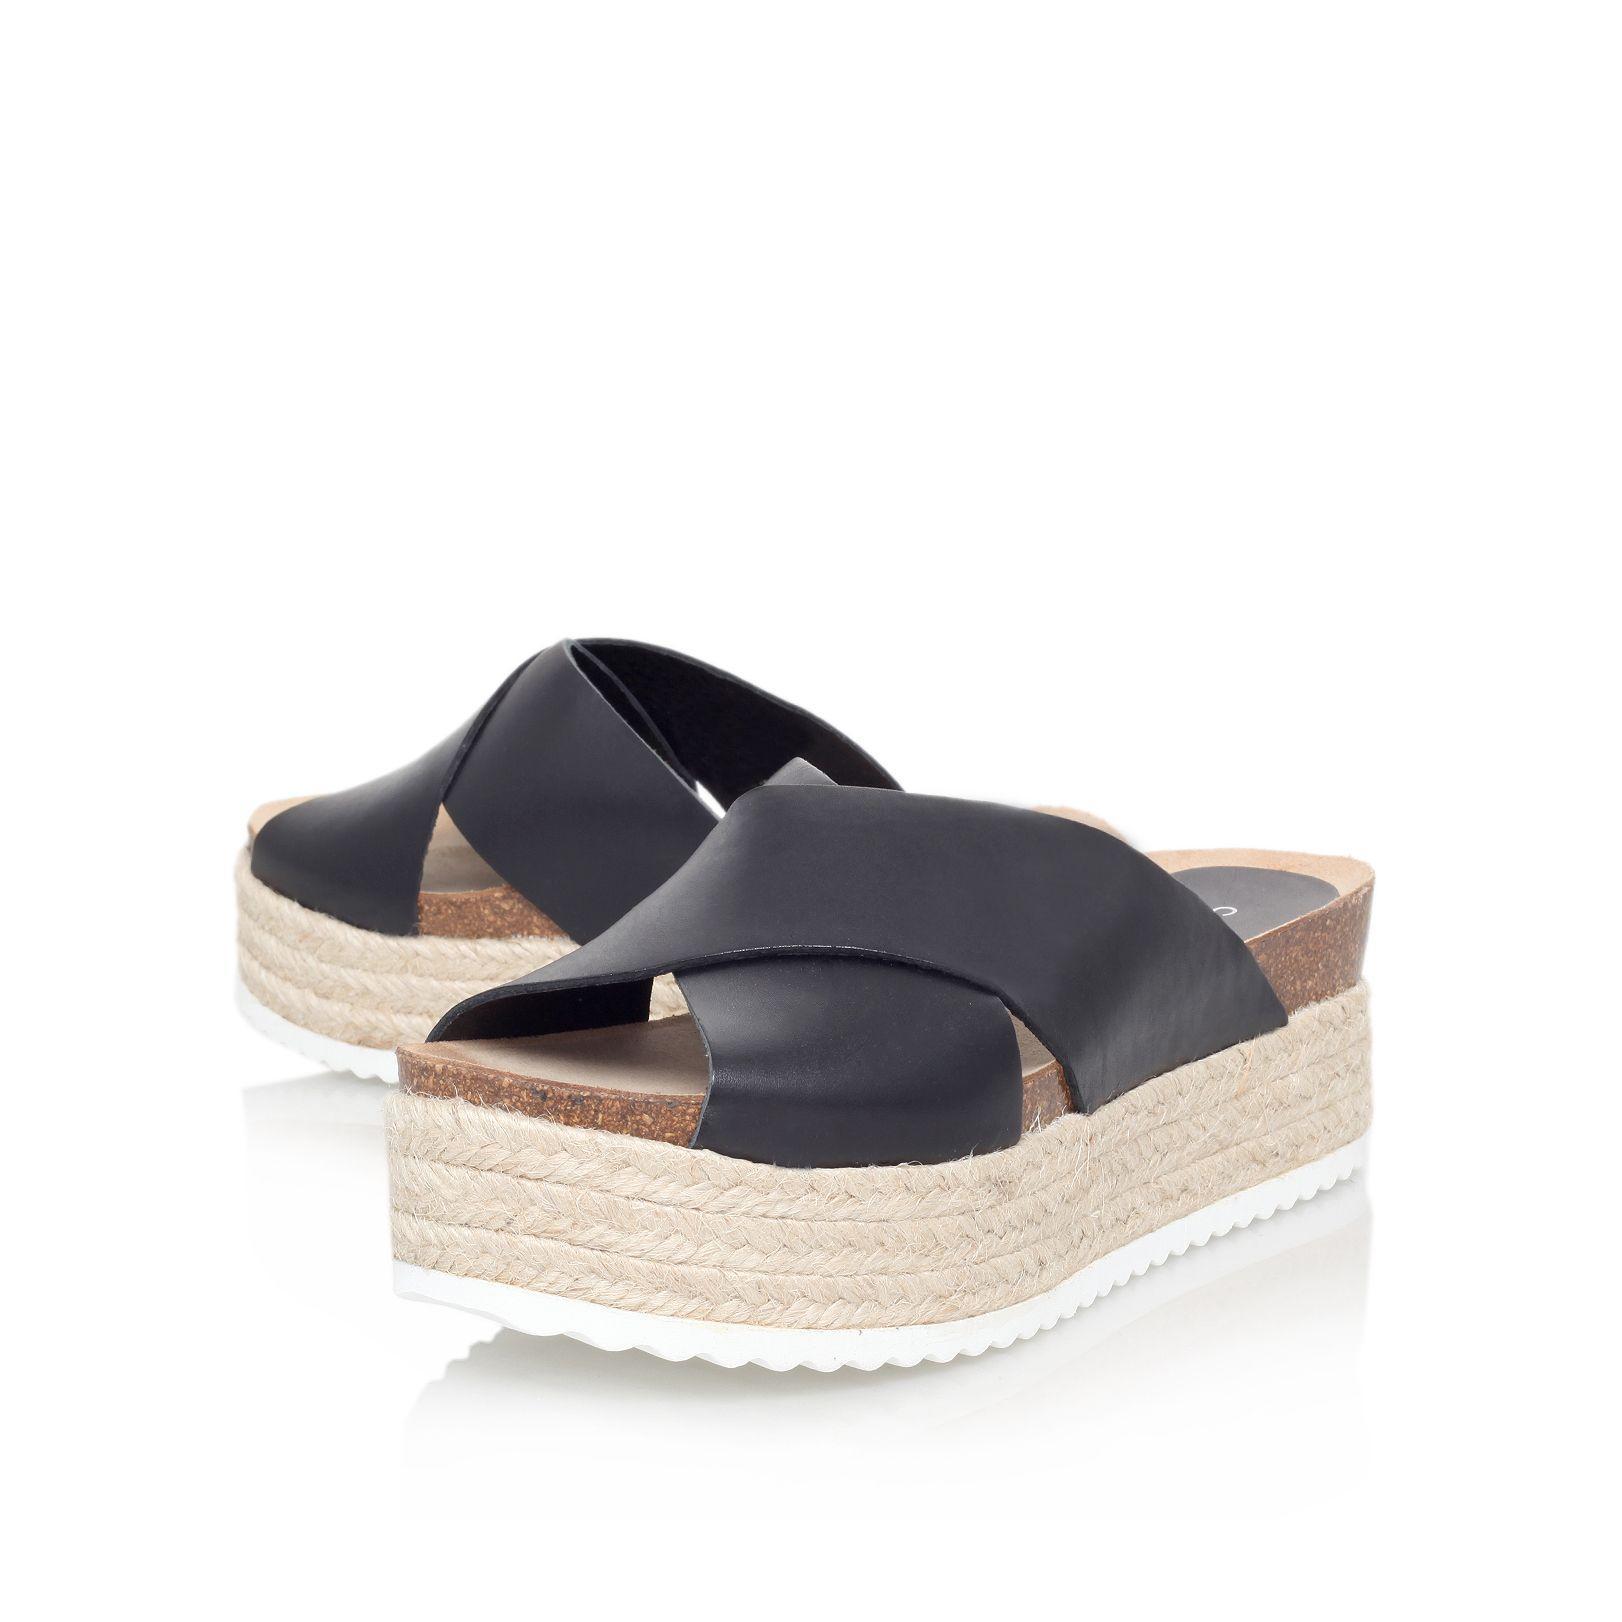 Carvela Kurt Geiger Shoes Uk